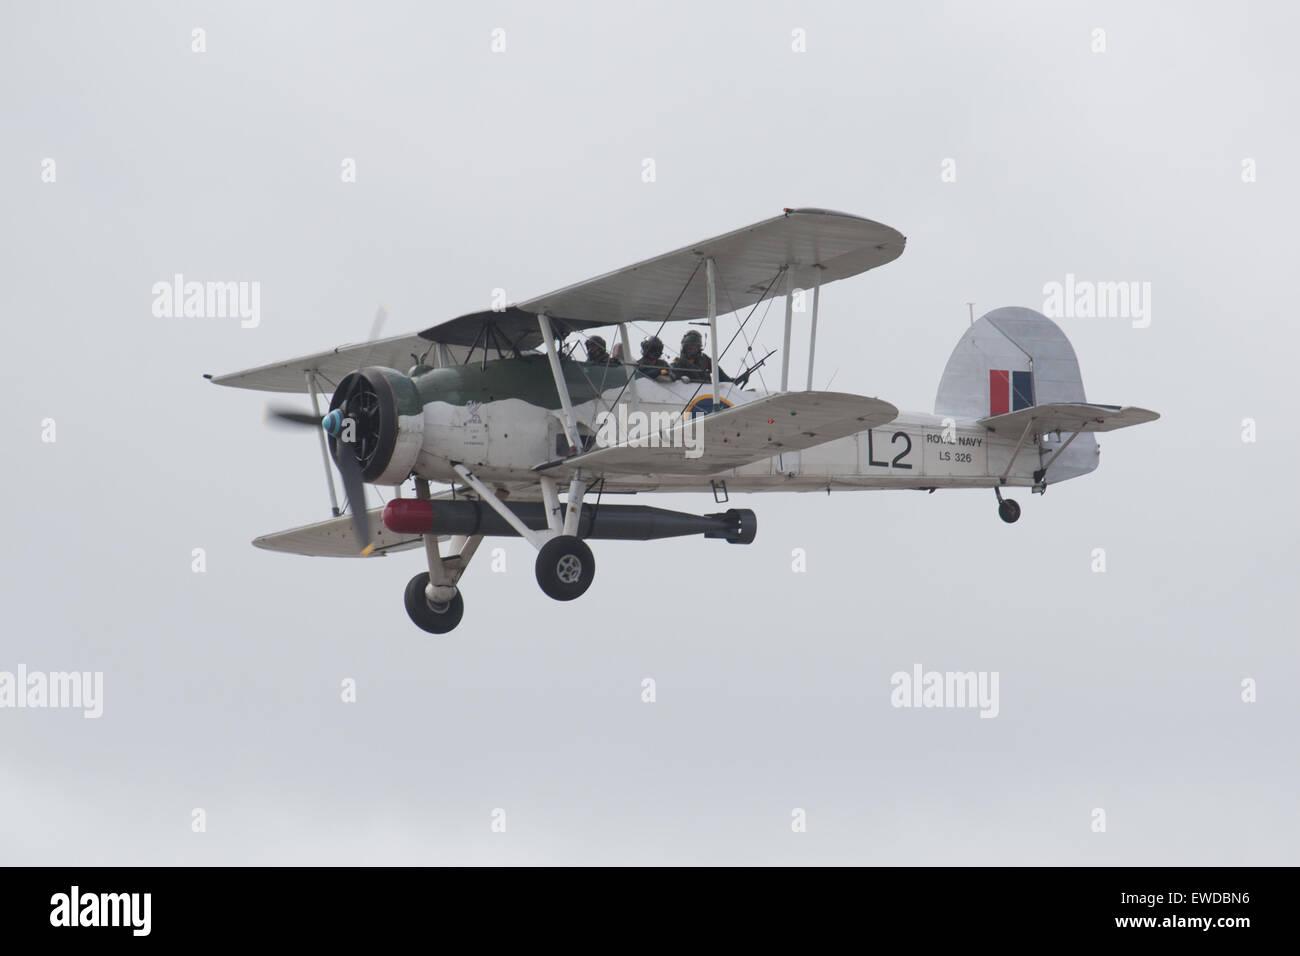 The Royal Navy Historic Flights Fairey Swordfish II LS 326 Bi-plane - Stock Image